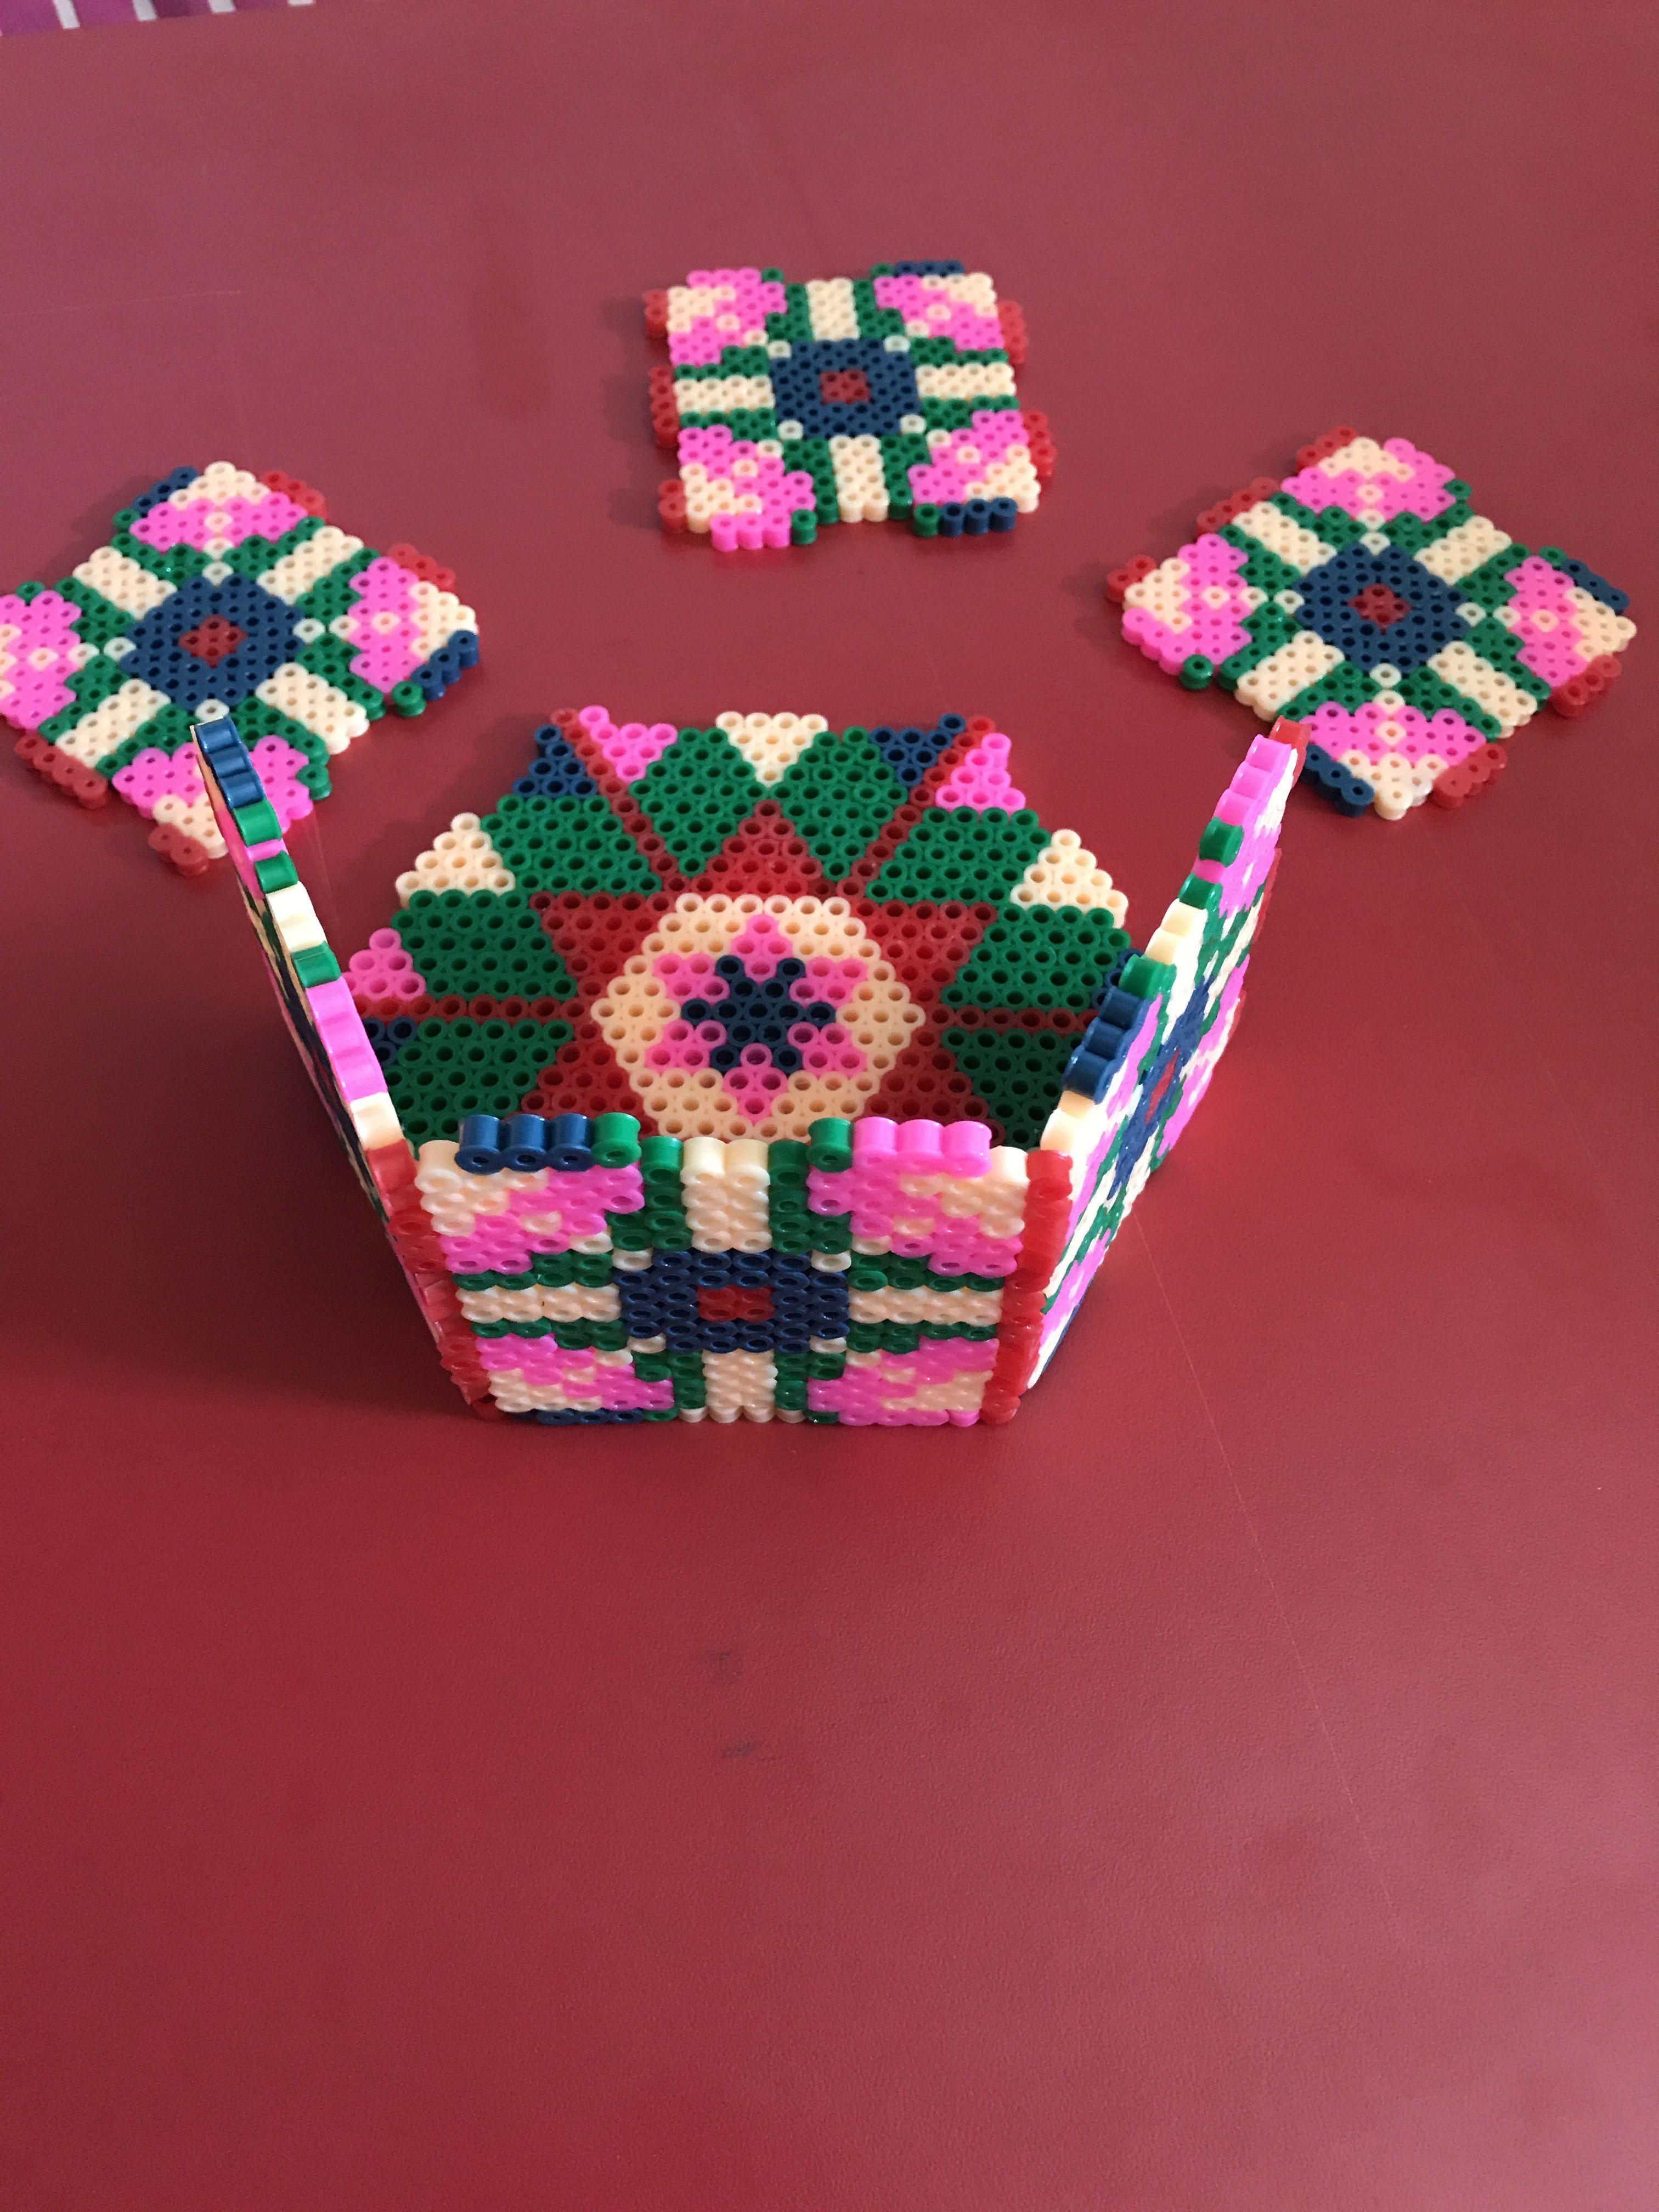 hexágono hecho con hama beads